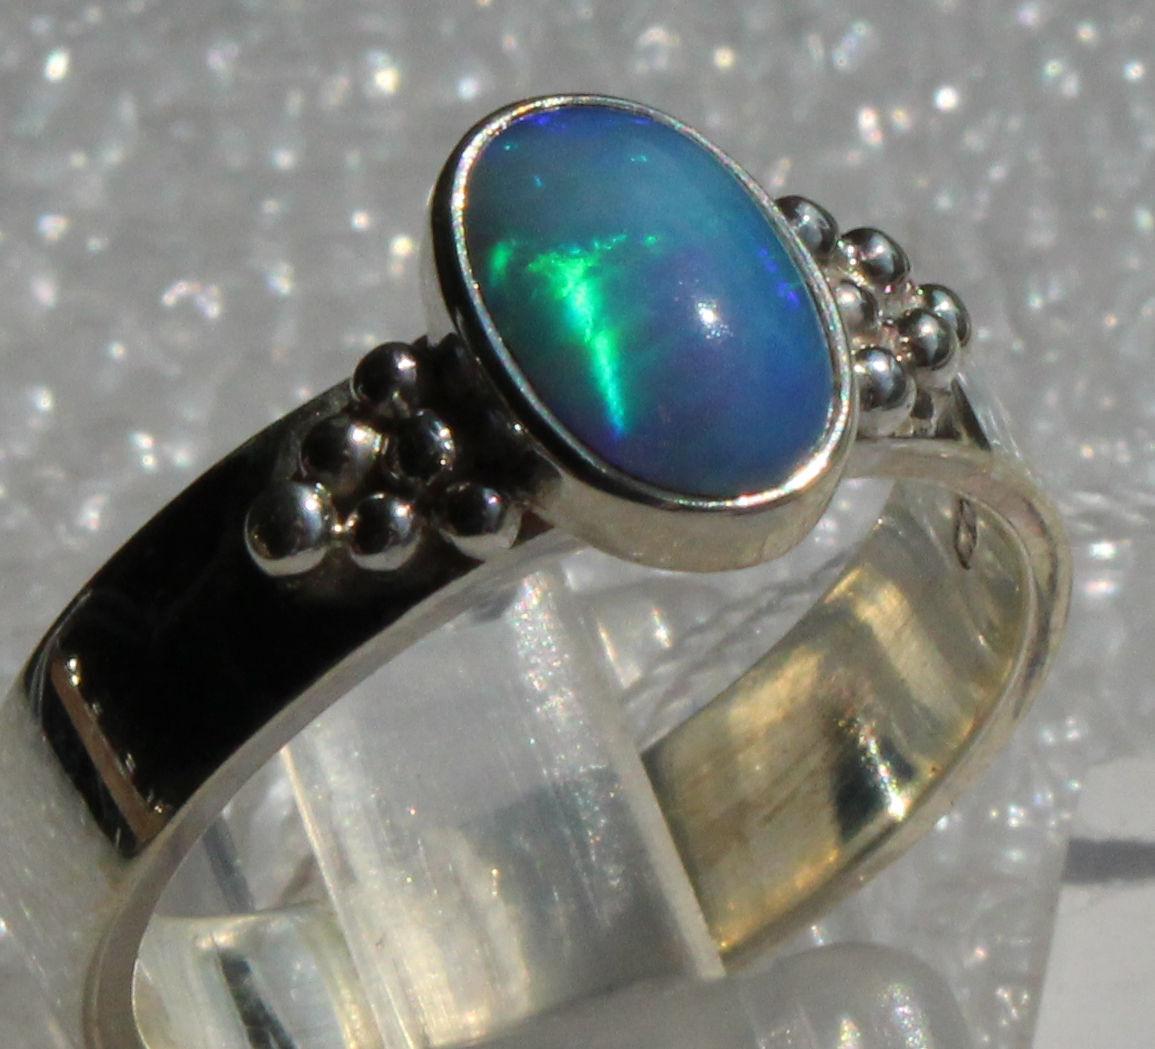 Multicolor Brazil Opal 1.15 Karat 950er silverring Größe 18,4 mm Unikat